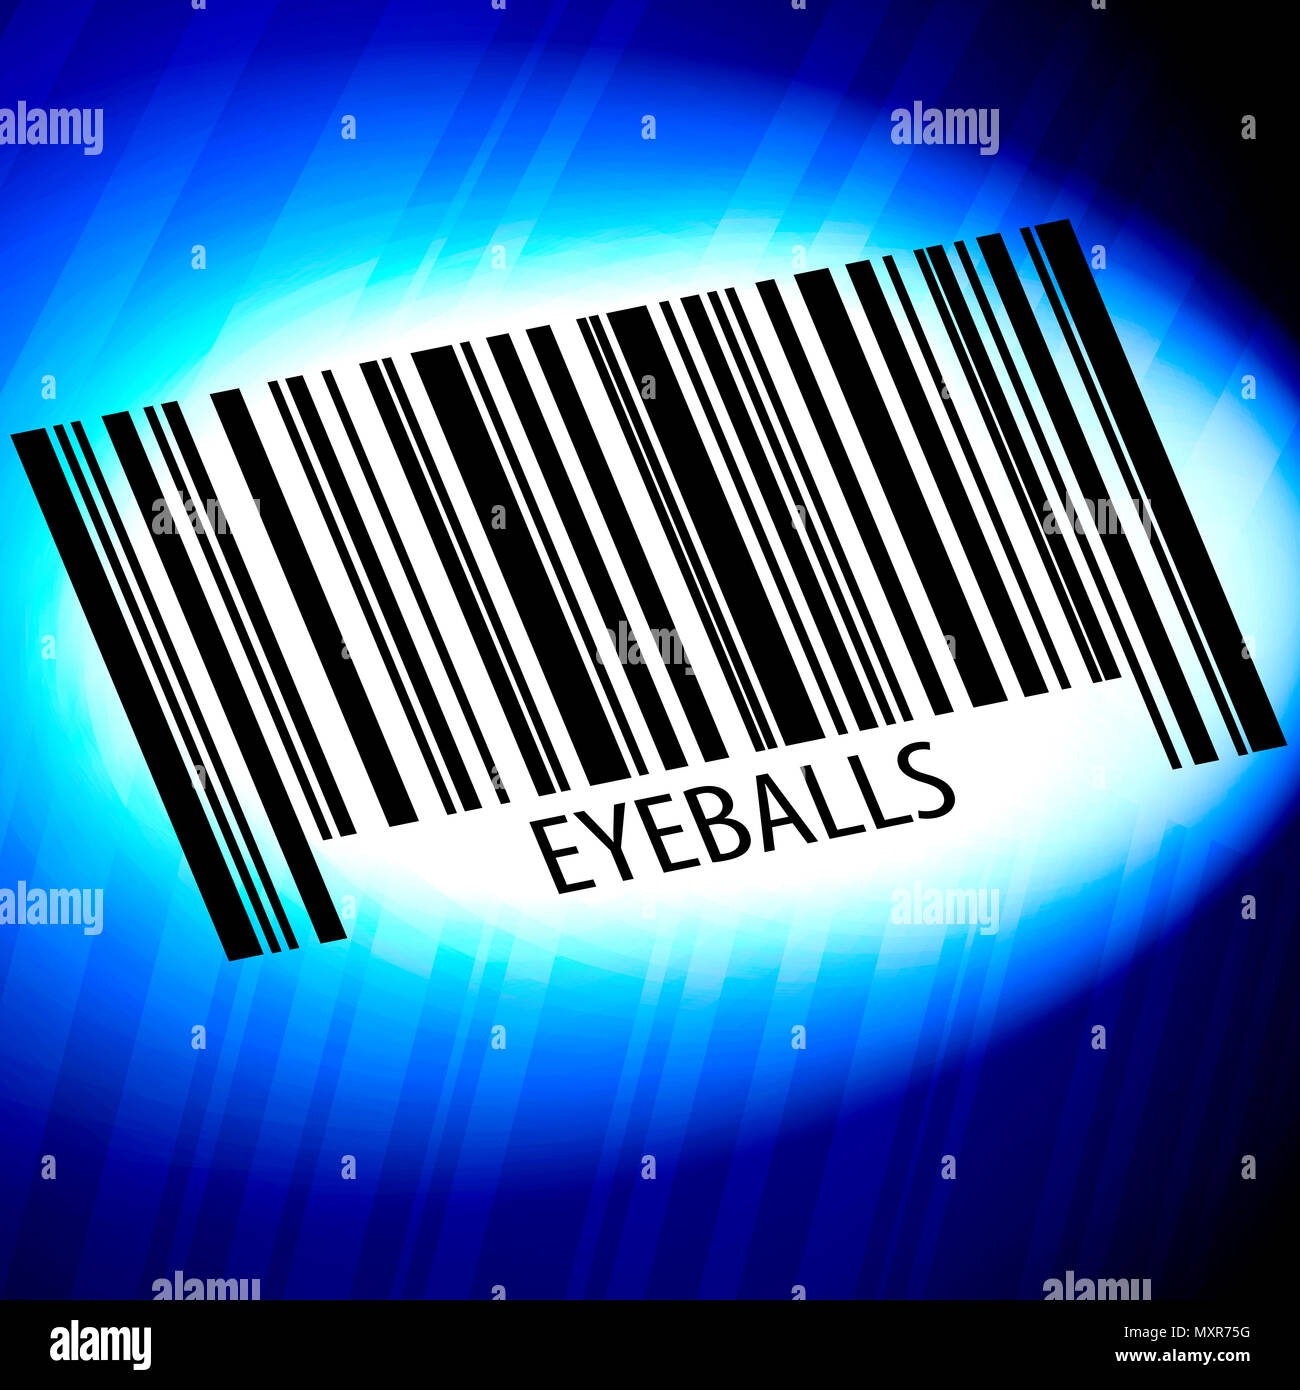 Eyeballs - barcode with blue Background - Stock Image